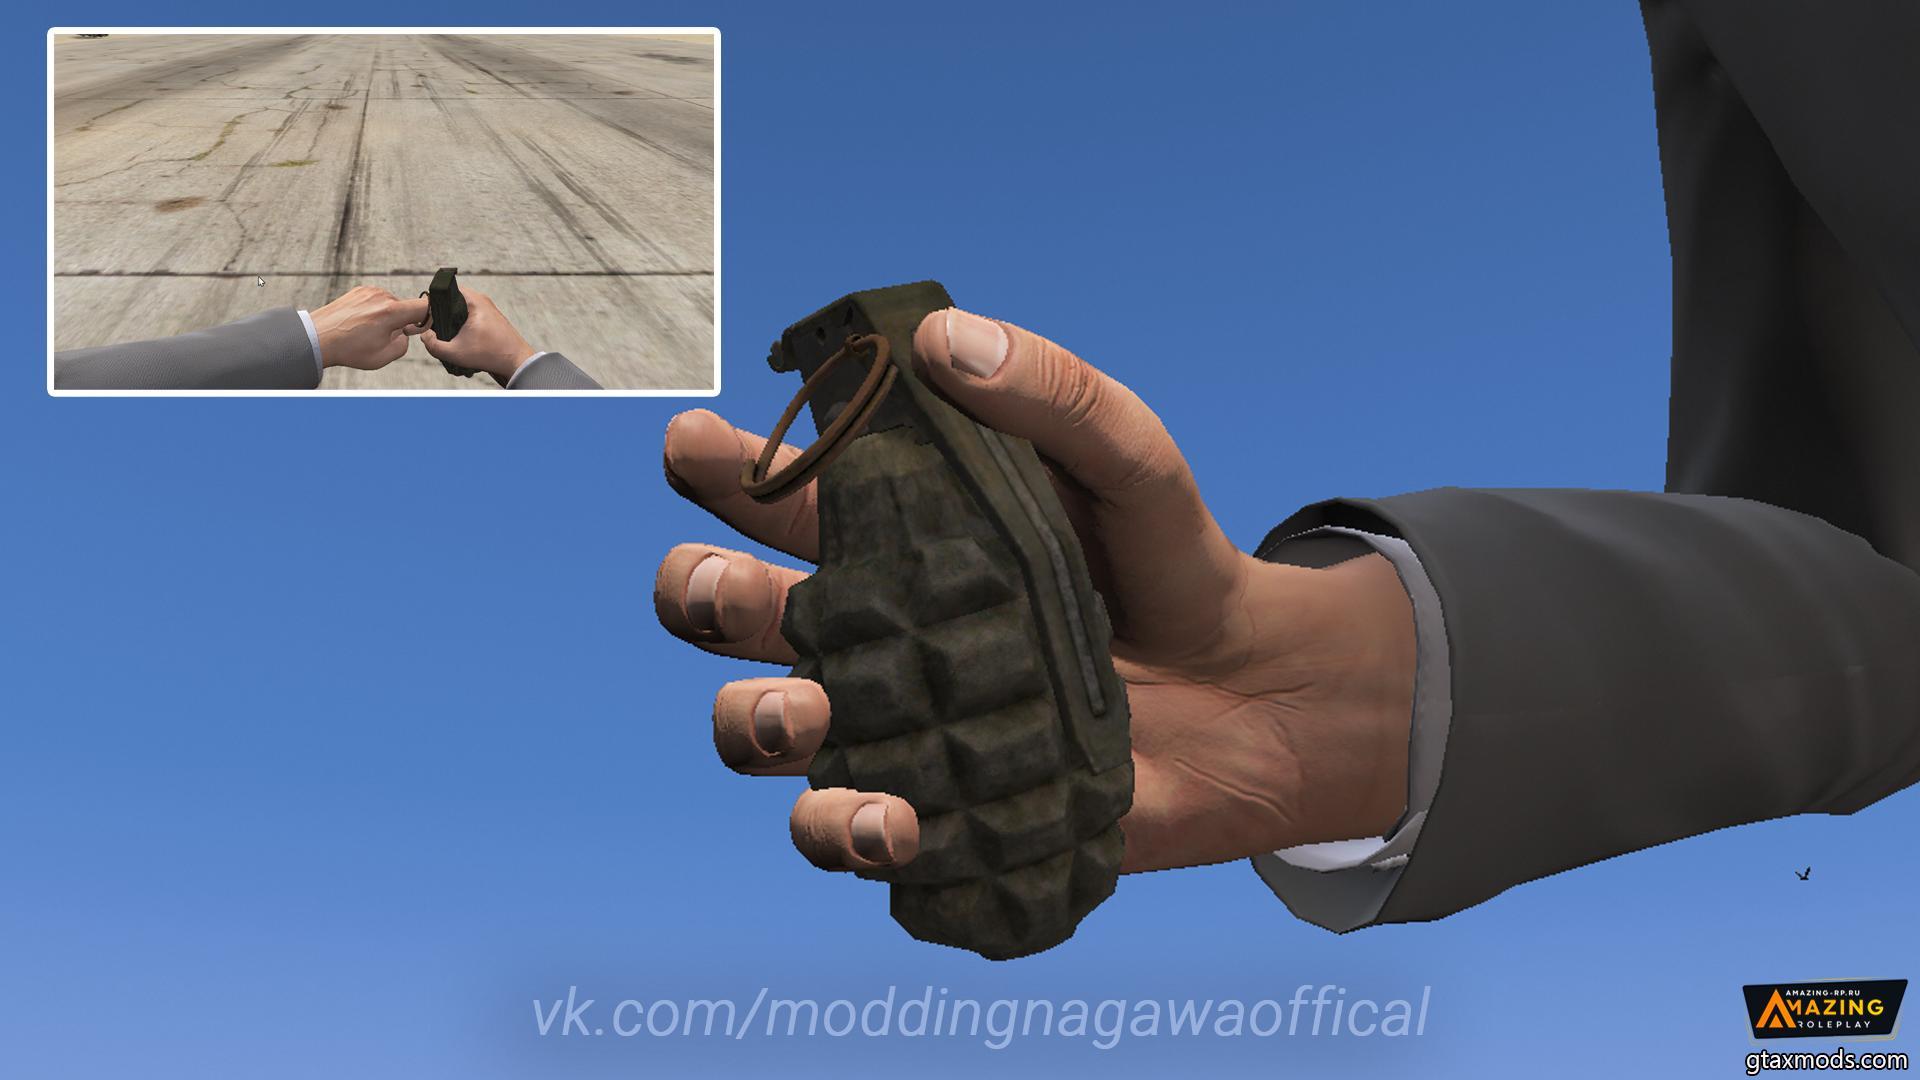 MK2 Frag Grenade